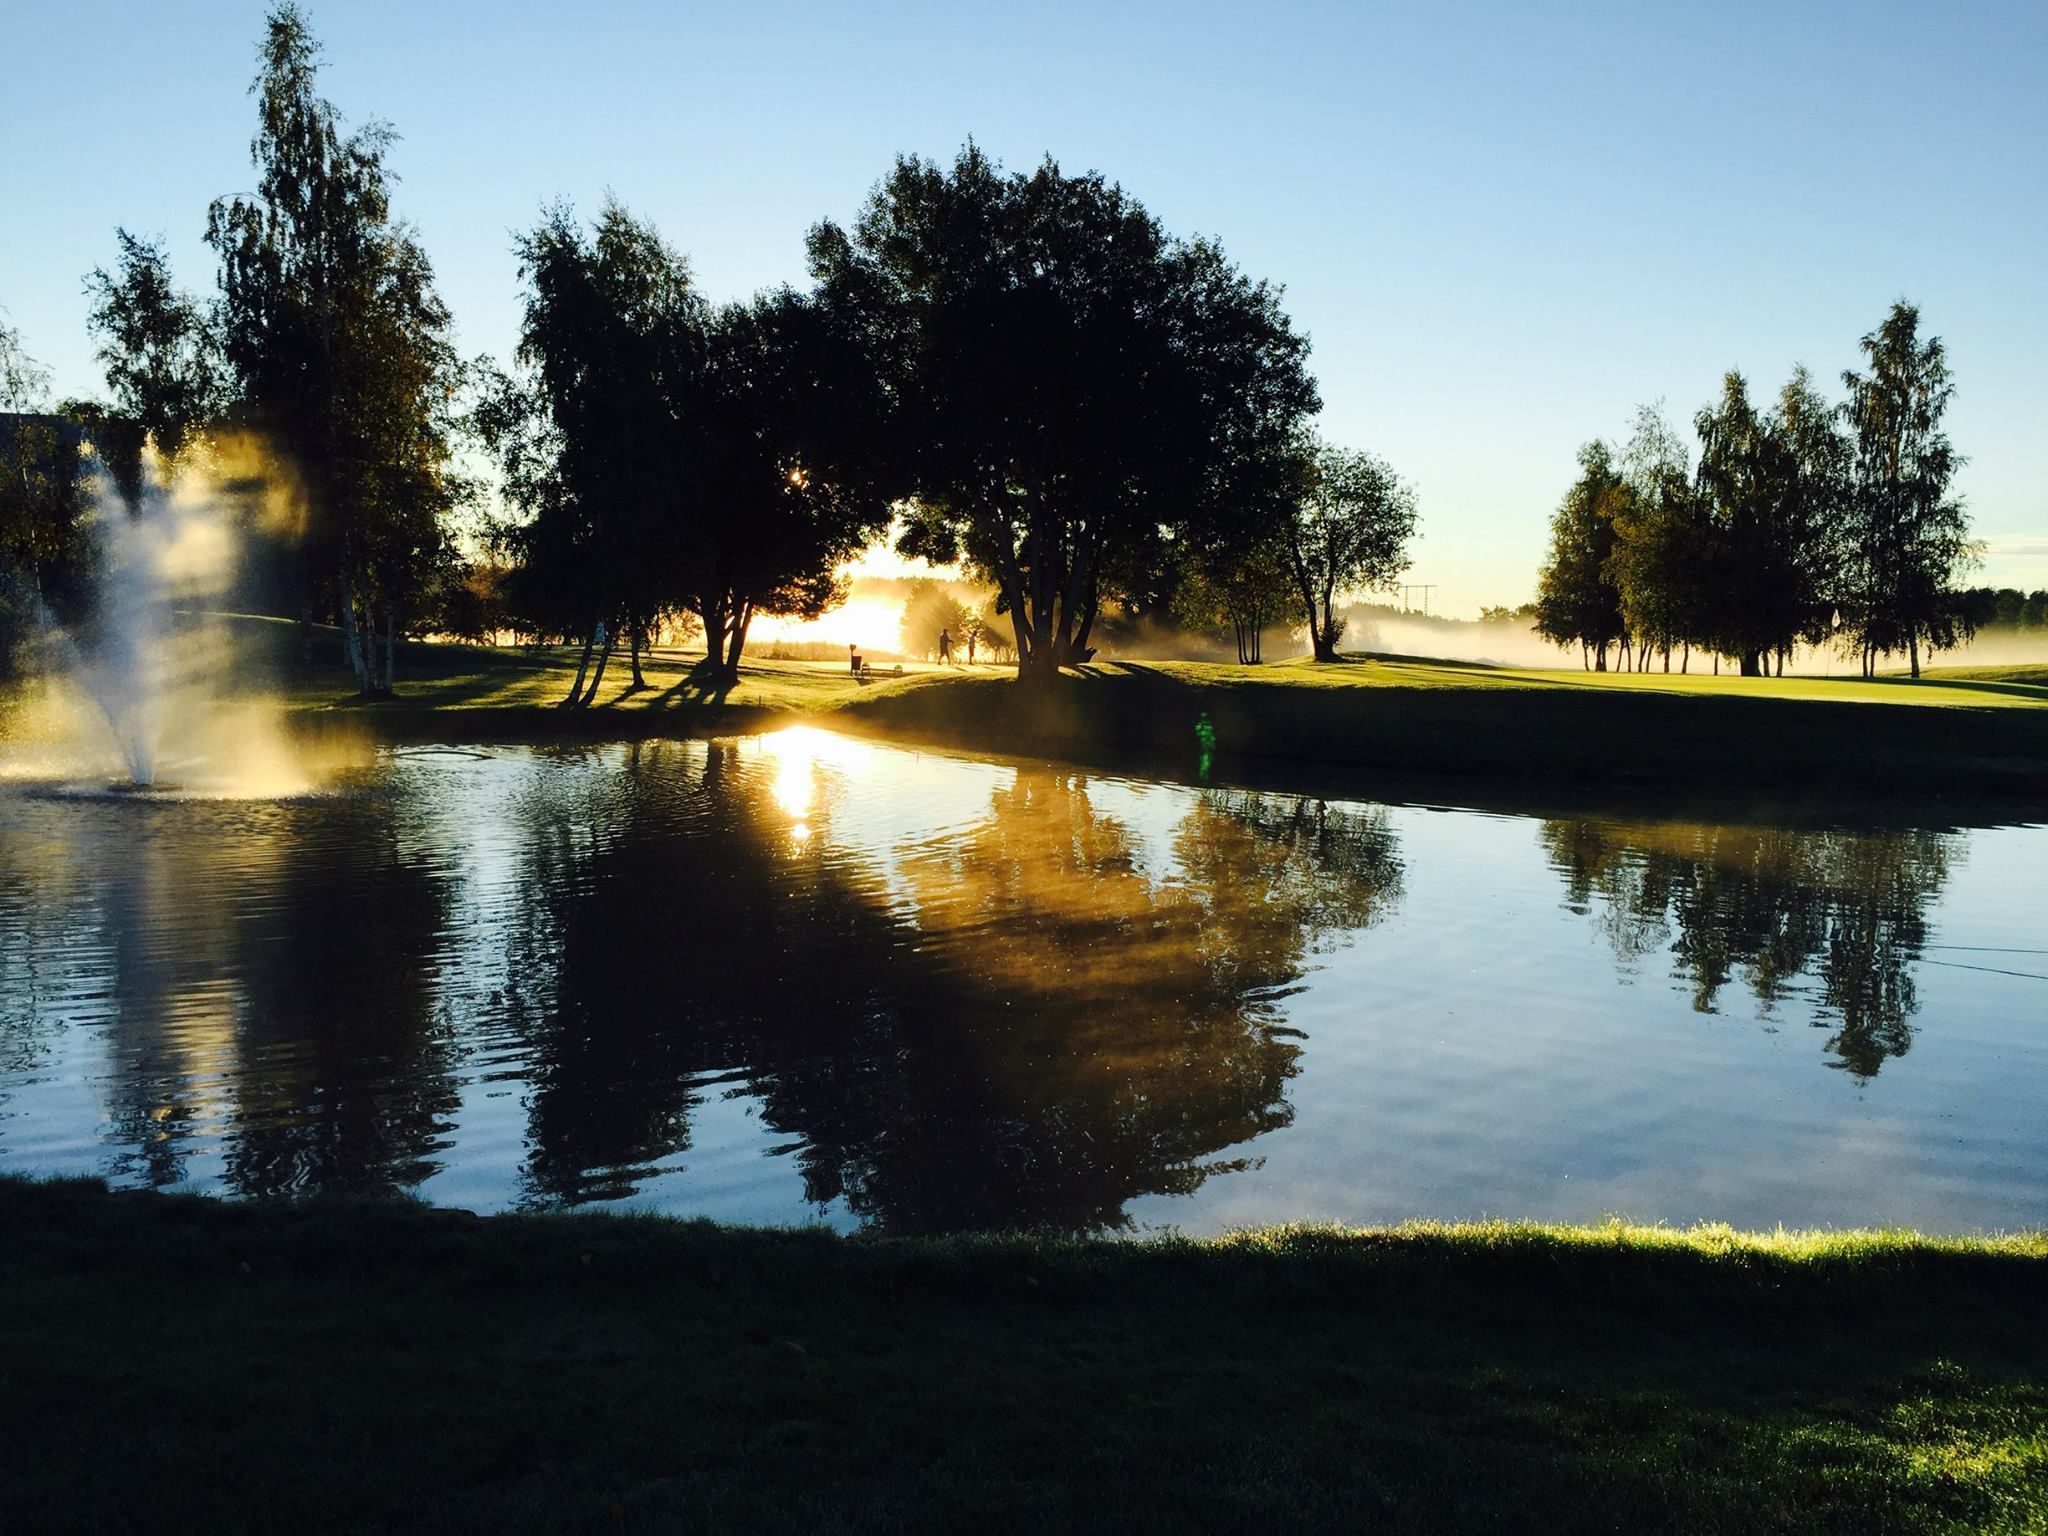 Arlandastad golfklubb cover picture